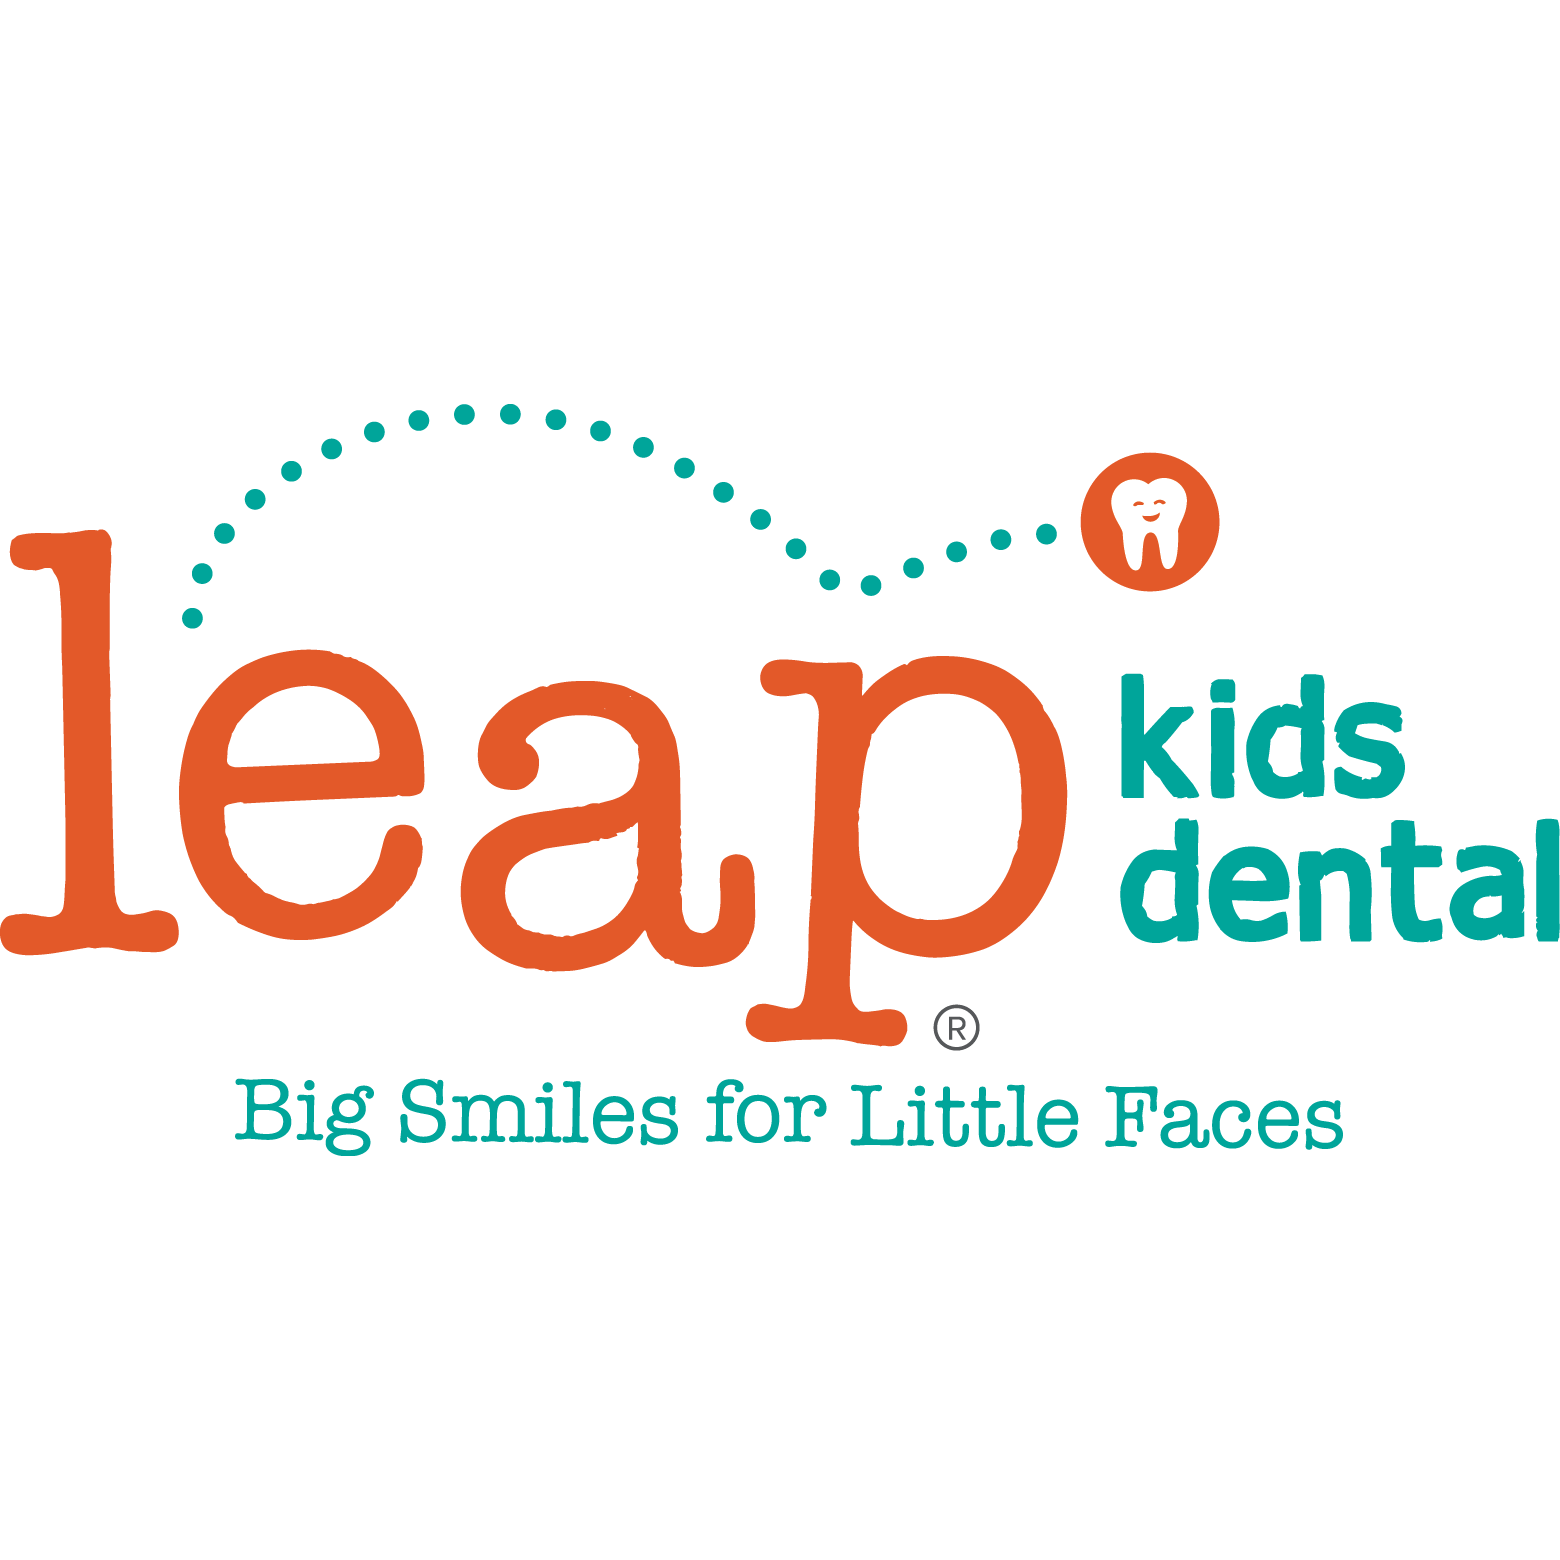 Emily K. Cheek, DDS, Pediatric Dentist